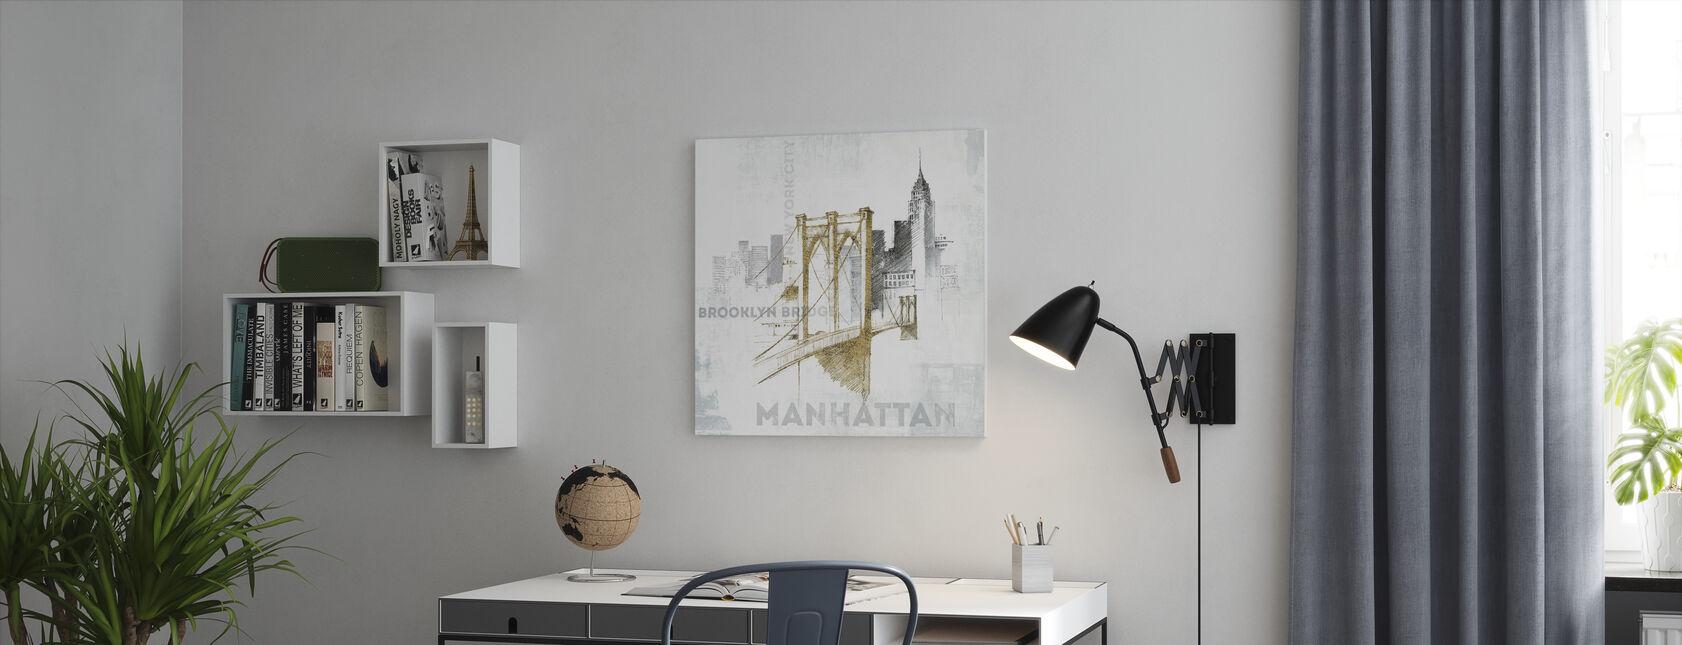 Brooklyn Bridge - Canvas print - Office